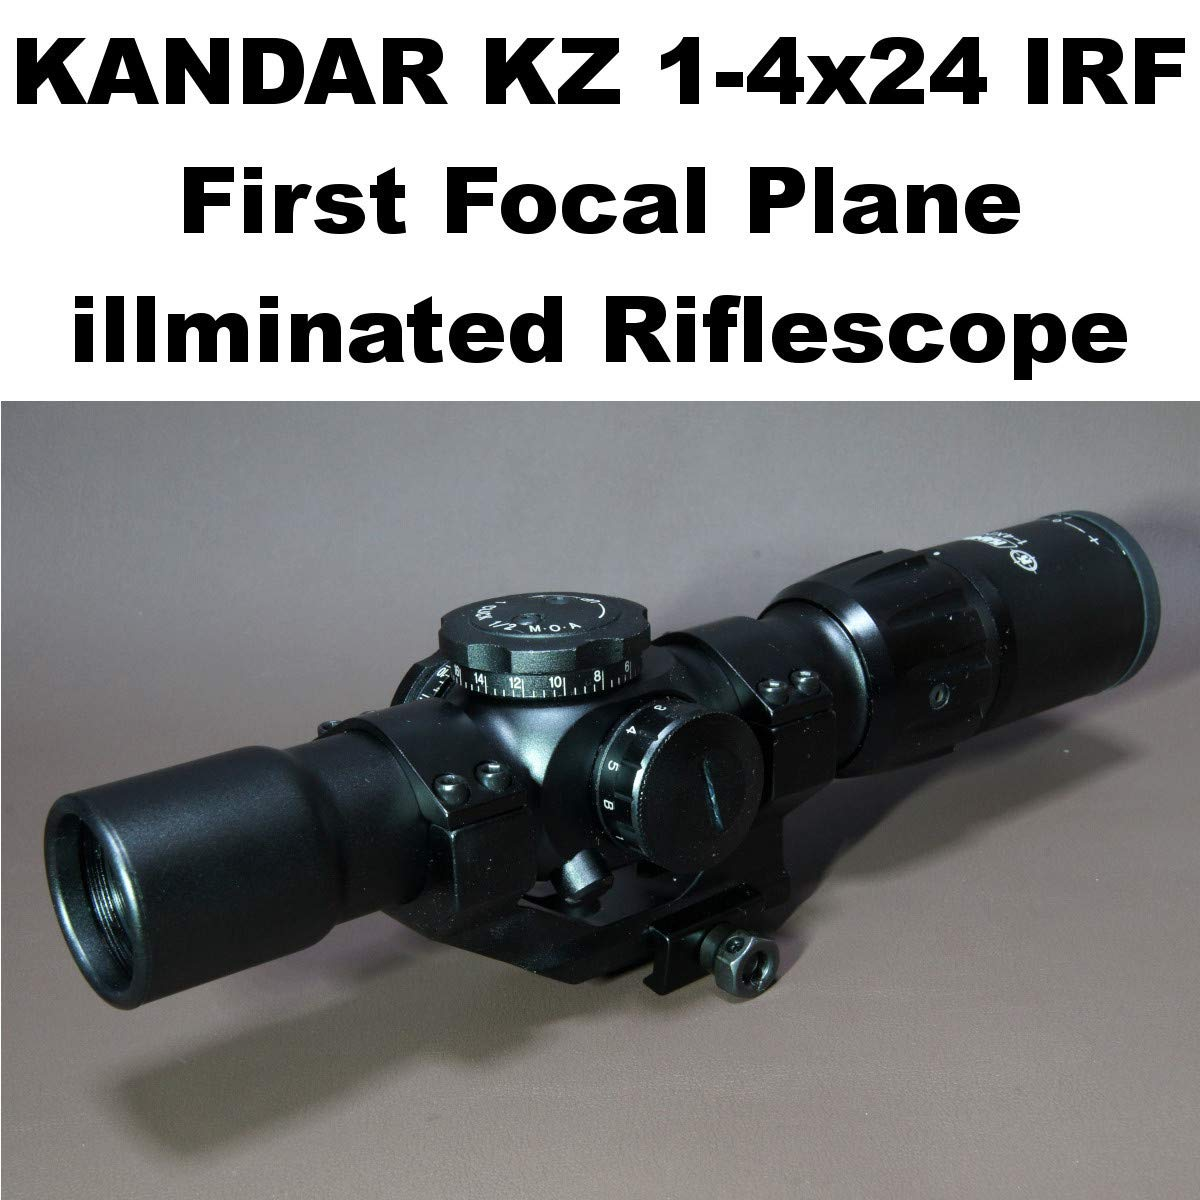 KANDAR KZ 1-4x24 FFP ライフルスコープ ミルドット レティクル マウントリング付 (627) ショートスコープ スナイパー B07S924WH6